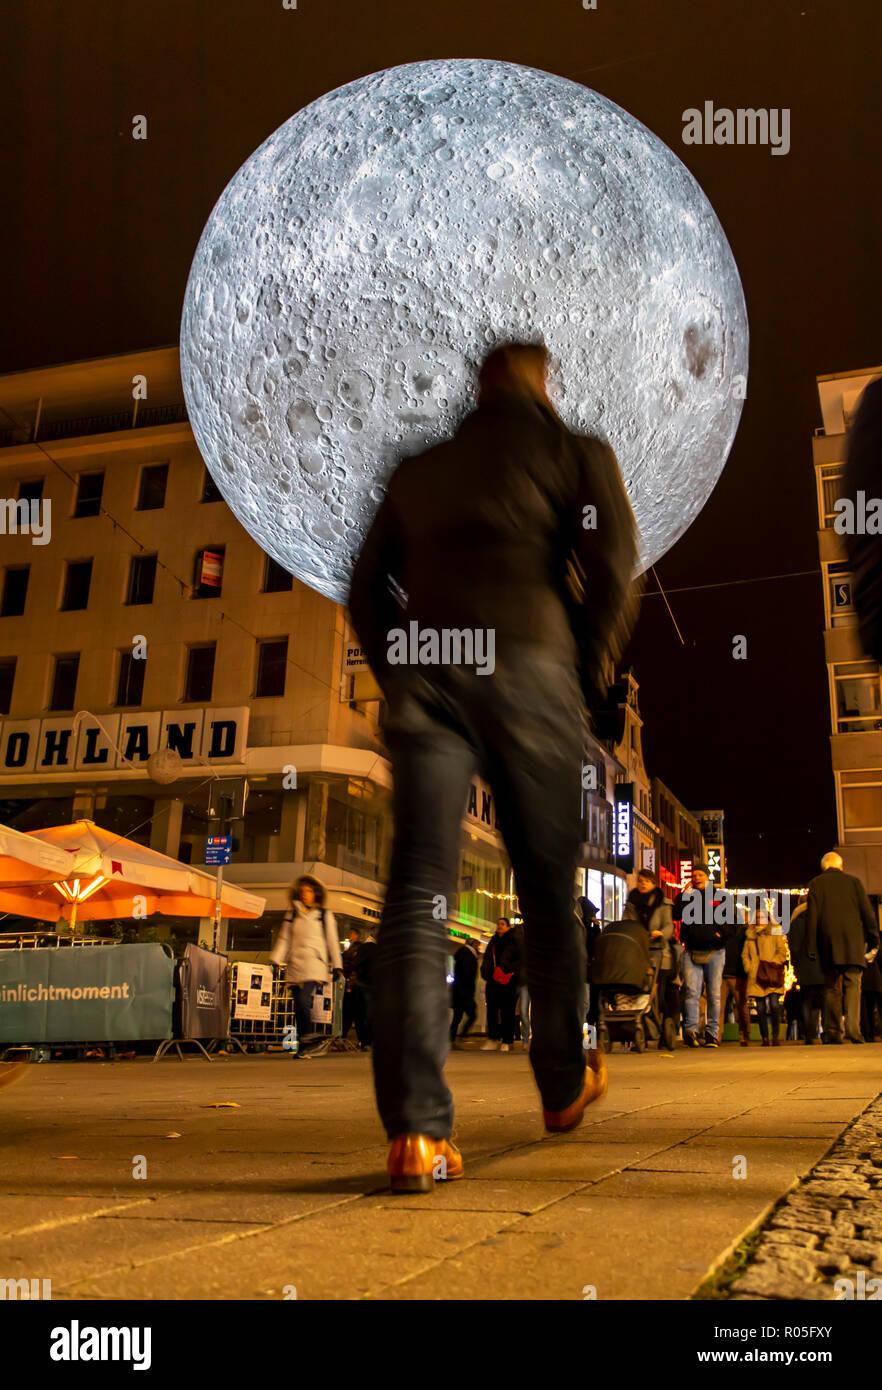 Essen Light Festival, light art installations in downtown Essen, Museum of the Moon, big shining moon, made from NASA photos, Kettwiger street, shoppi - Stock Image